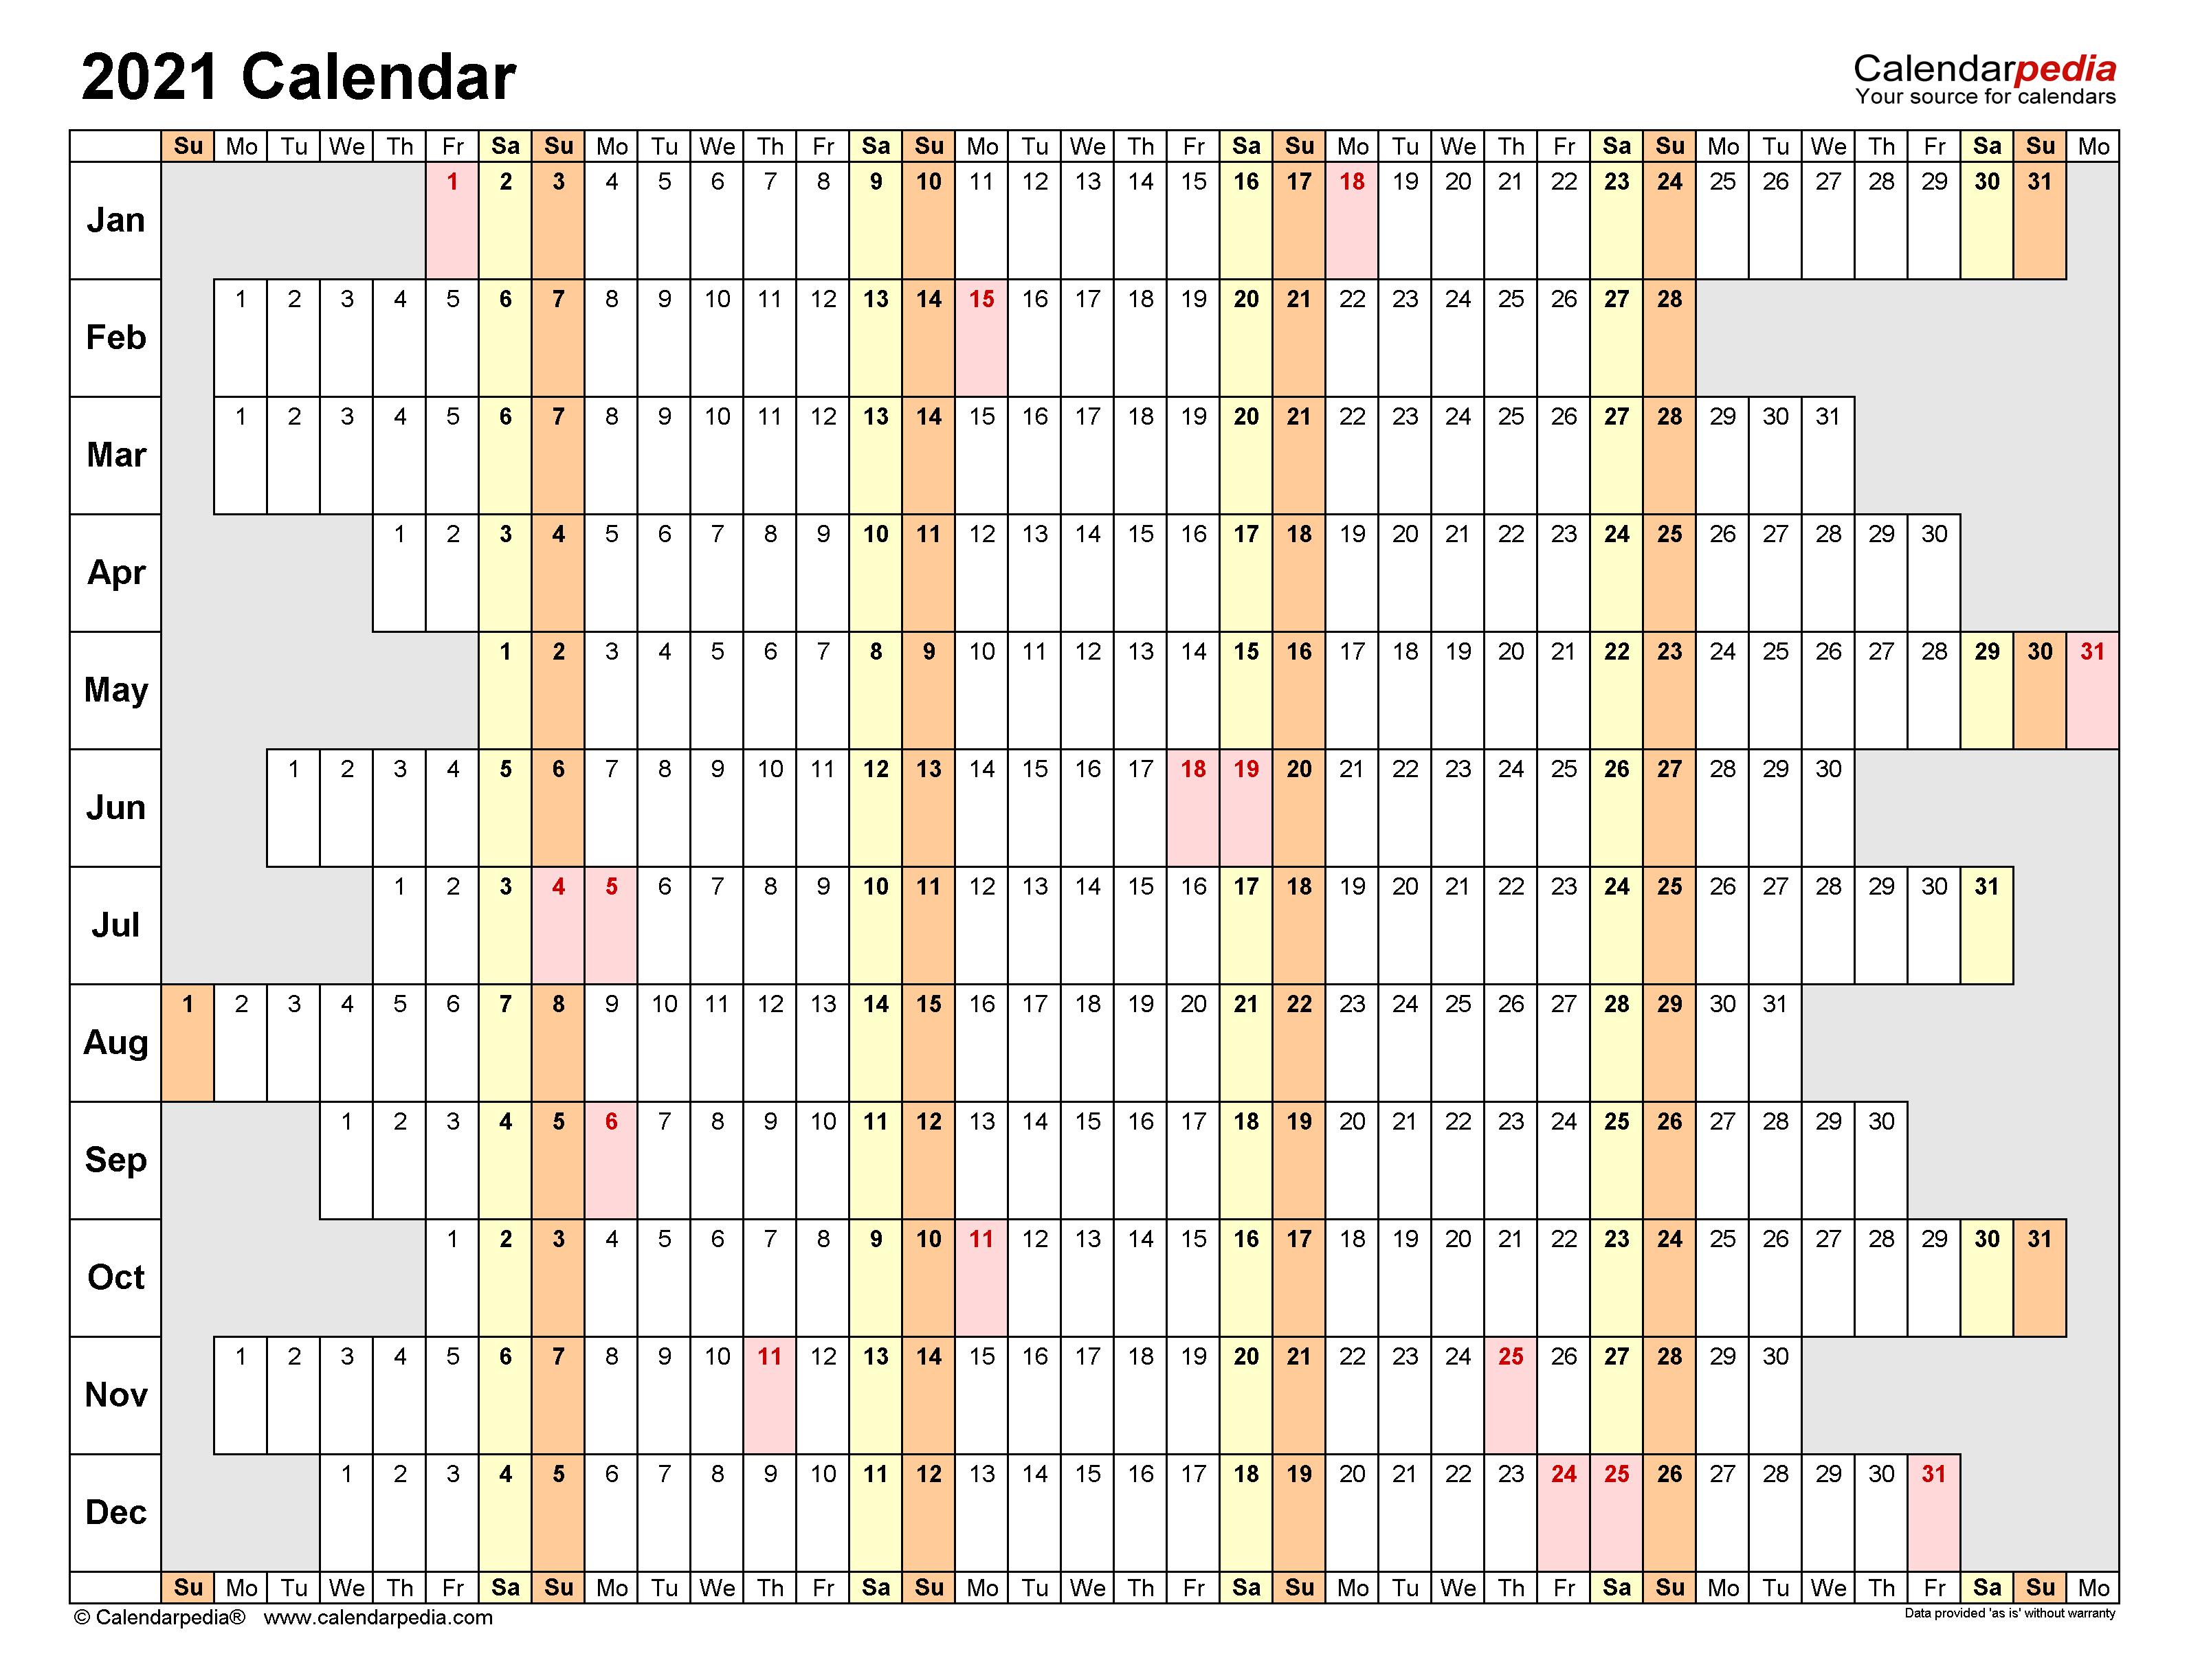 2021 Calendar   Free Printable Excel Templates   Calendarpedia